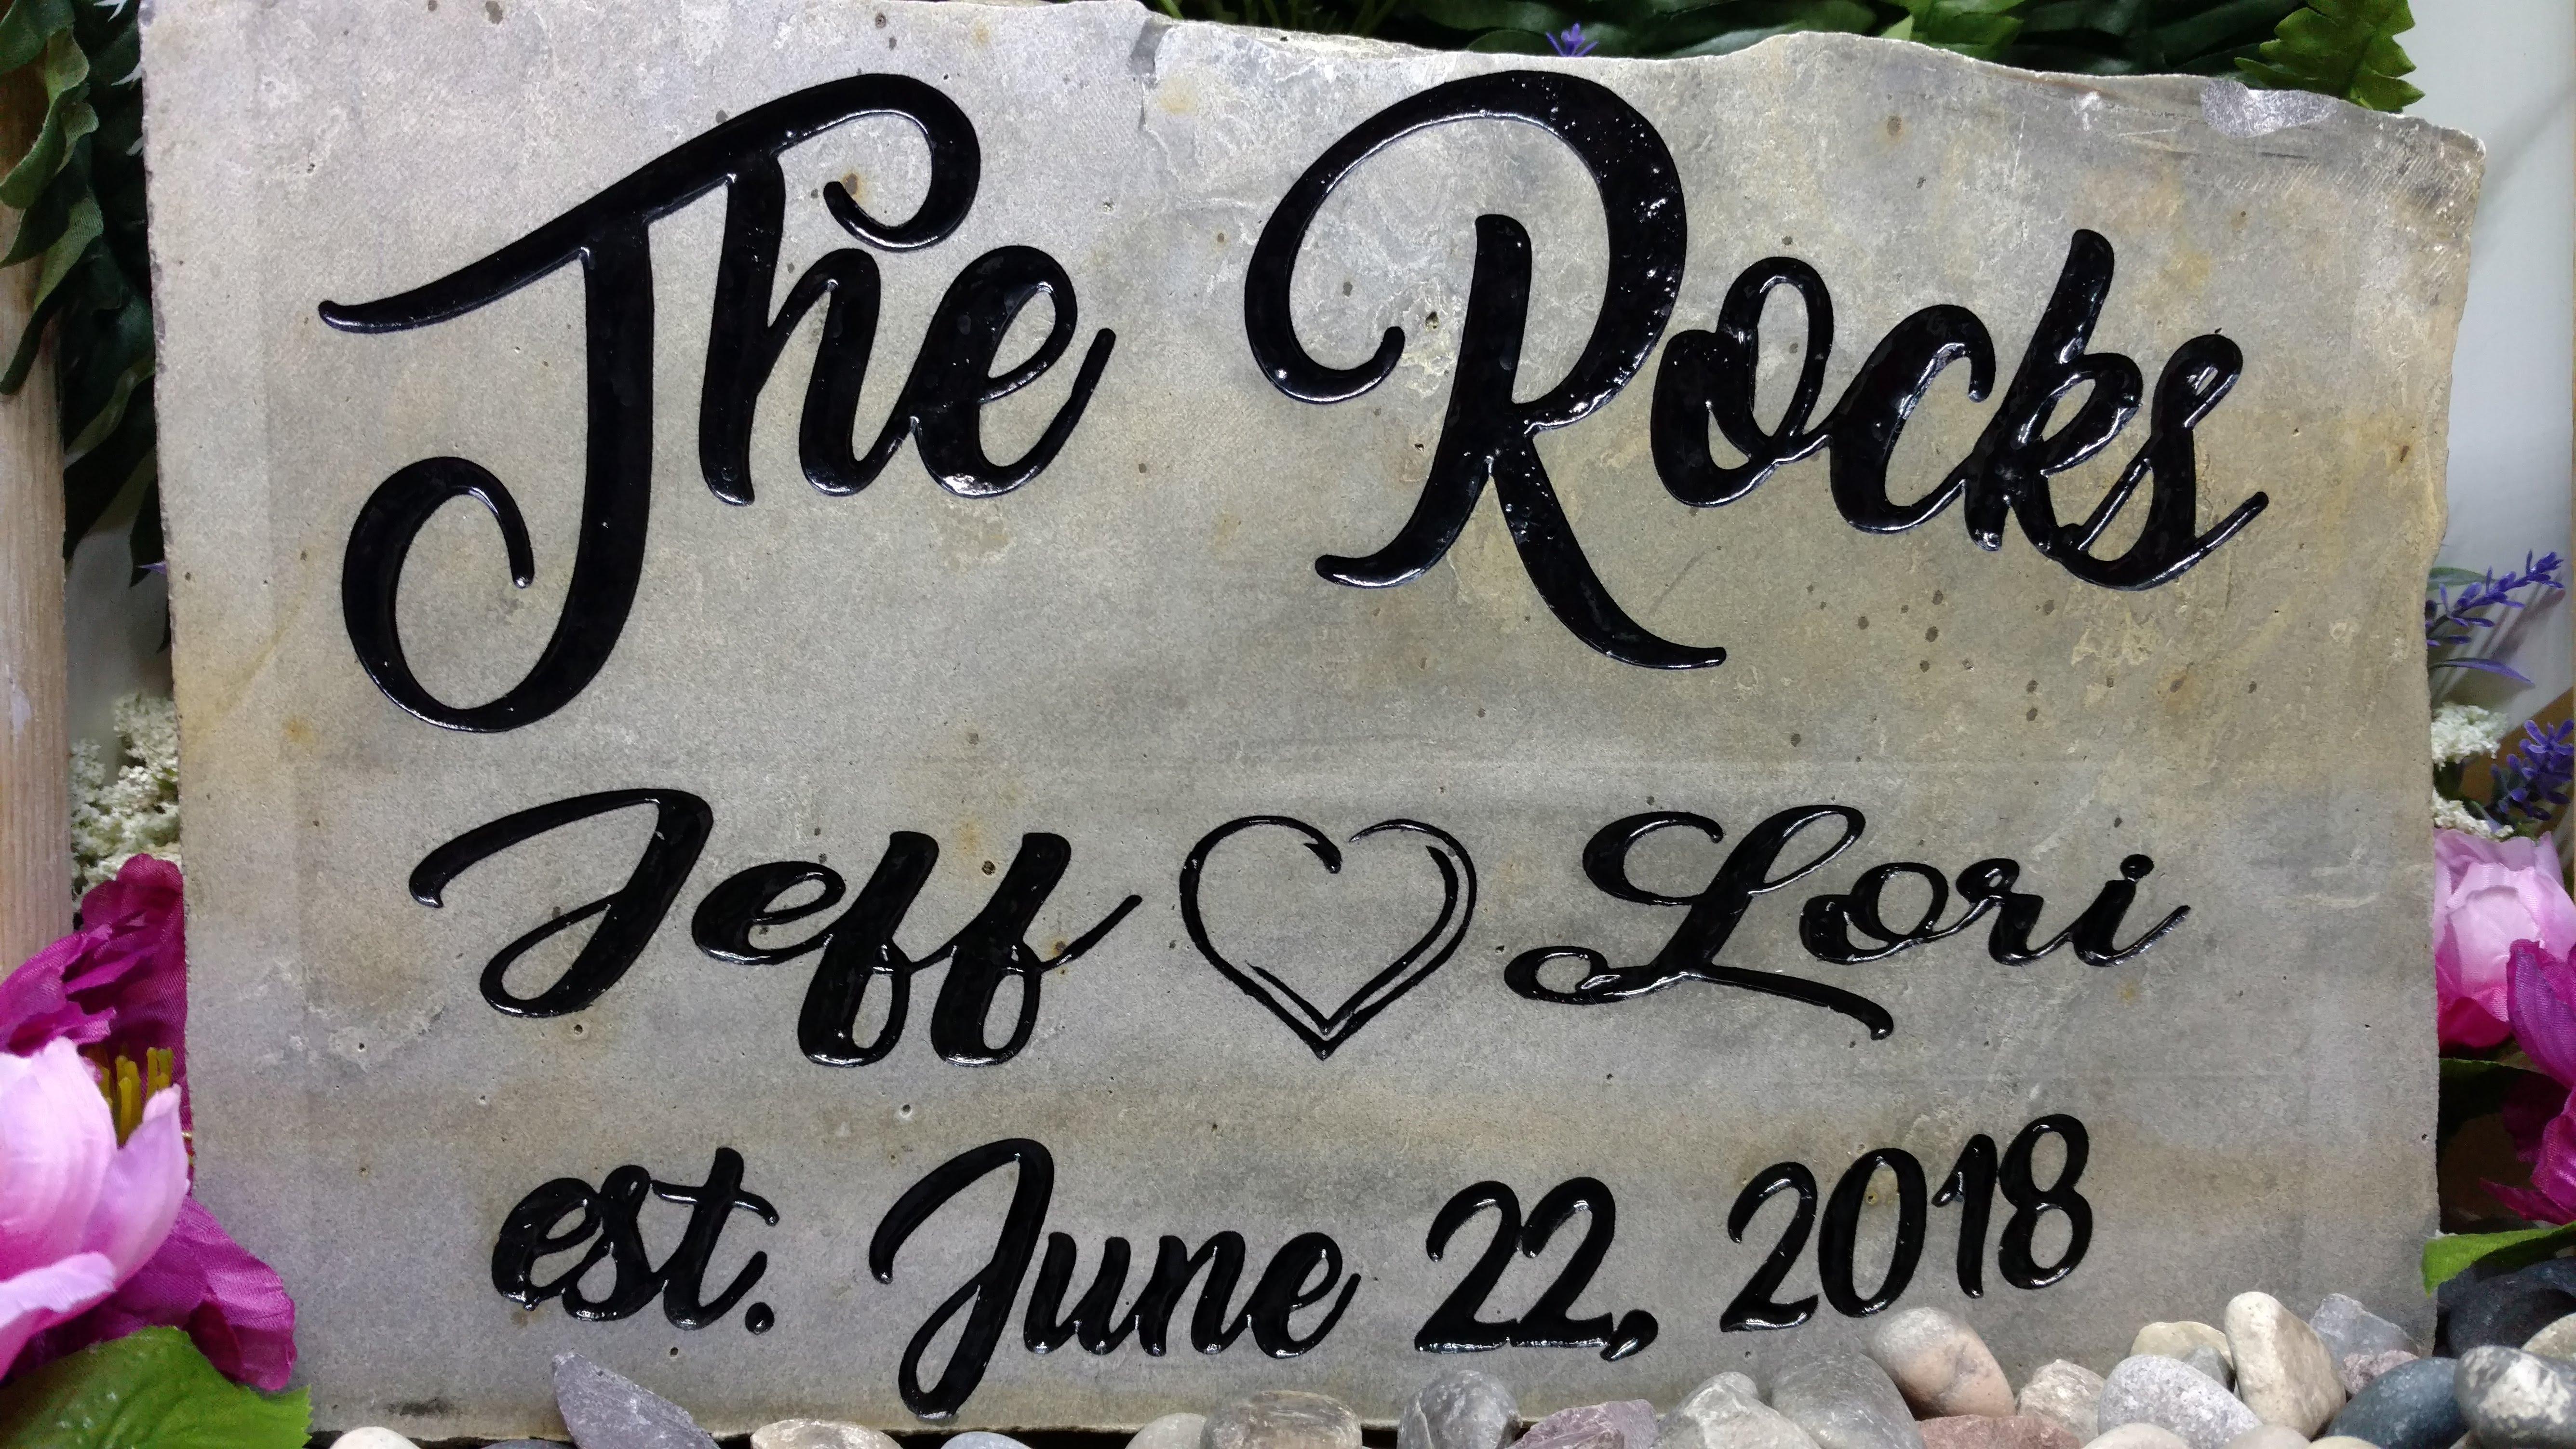 Family Crest Rock Names and Dates Establ